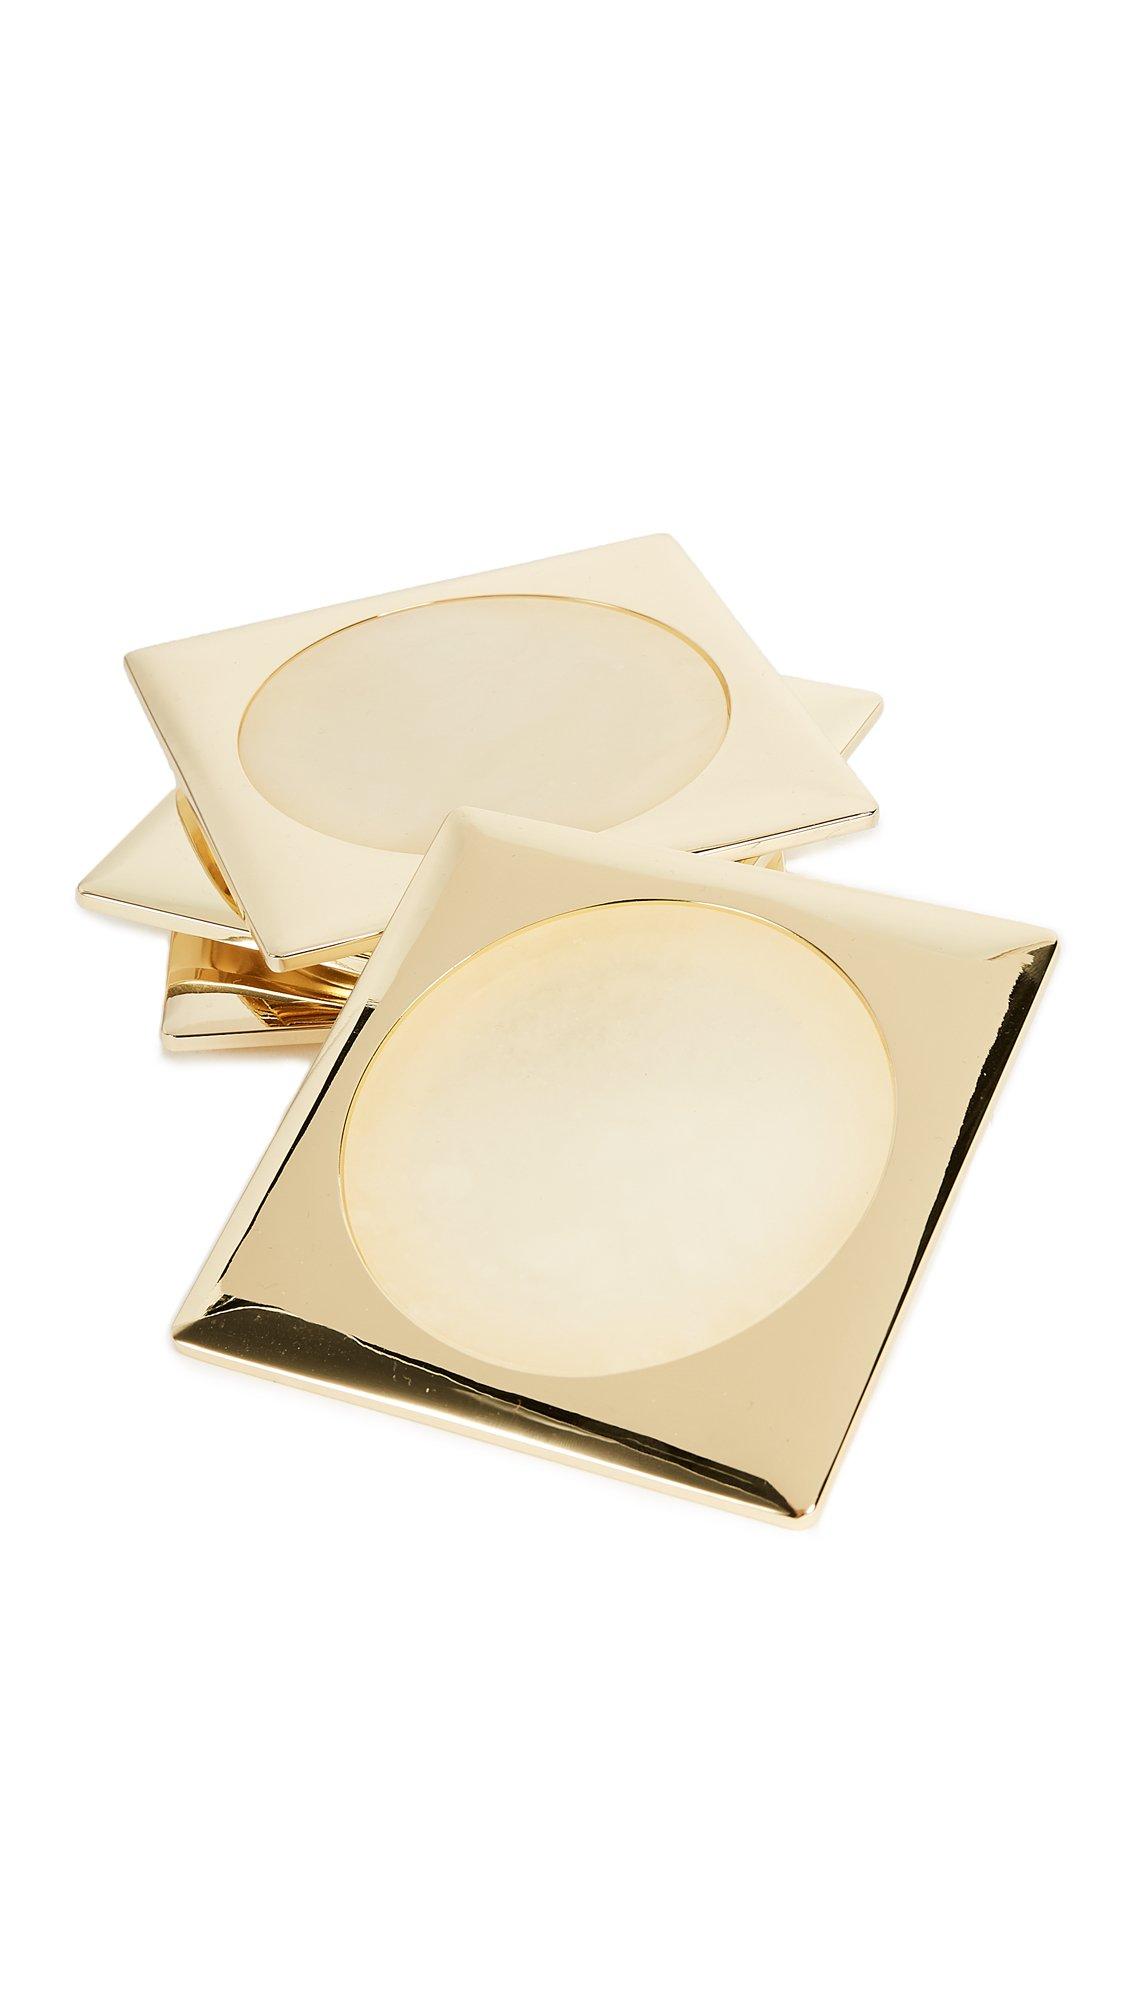 Gift Boutique Women's Circulo Set of 4 Coasters, Bianco Venato, One Size